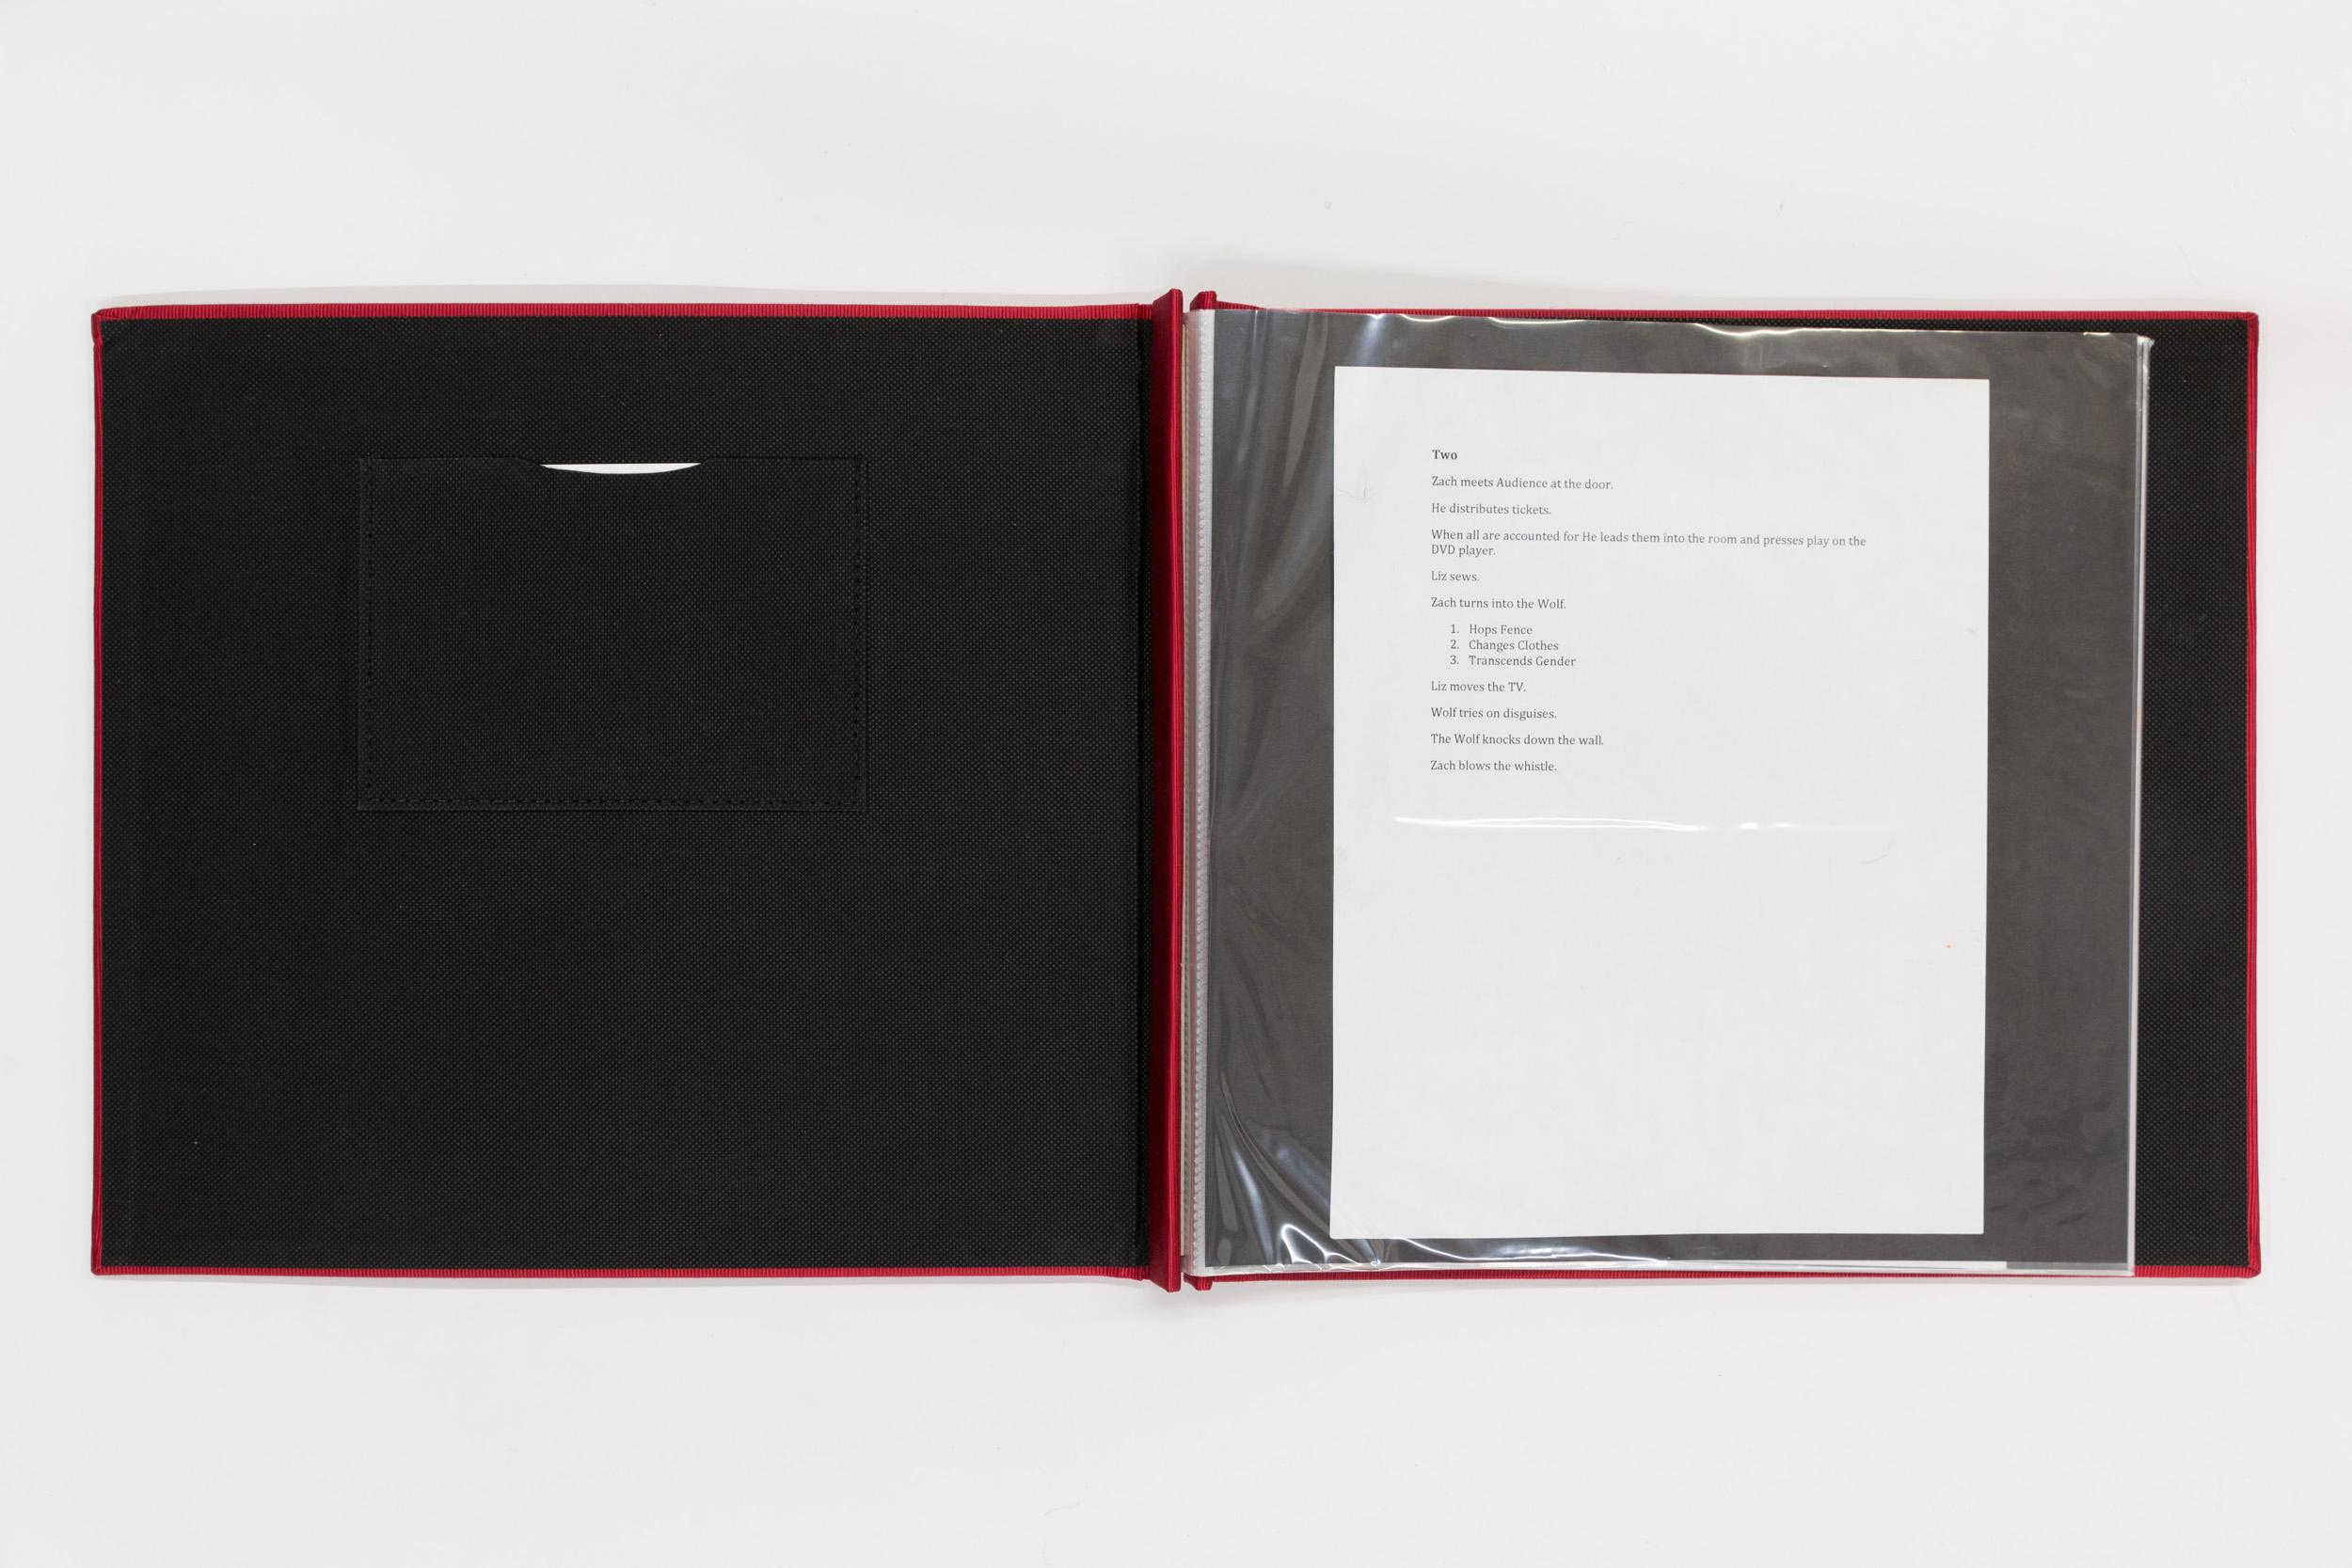 VGH_Book2_FirstPage.jpg